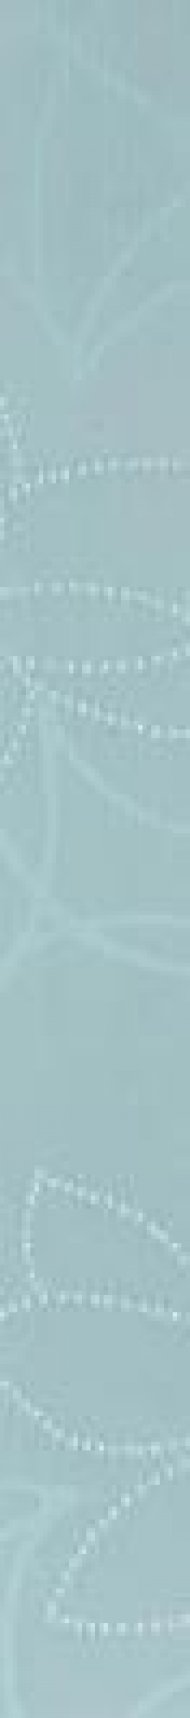 wlamh007-coral-modra-listela.jpg